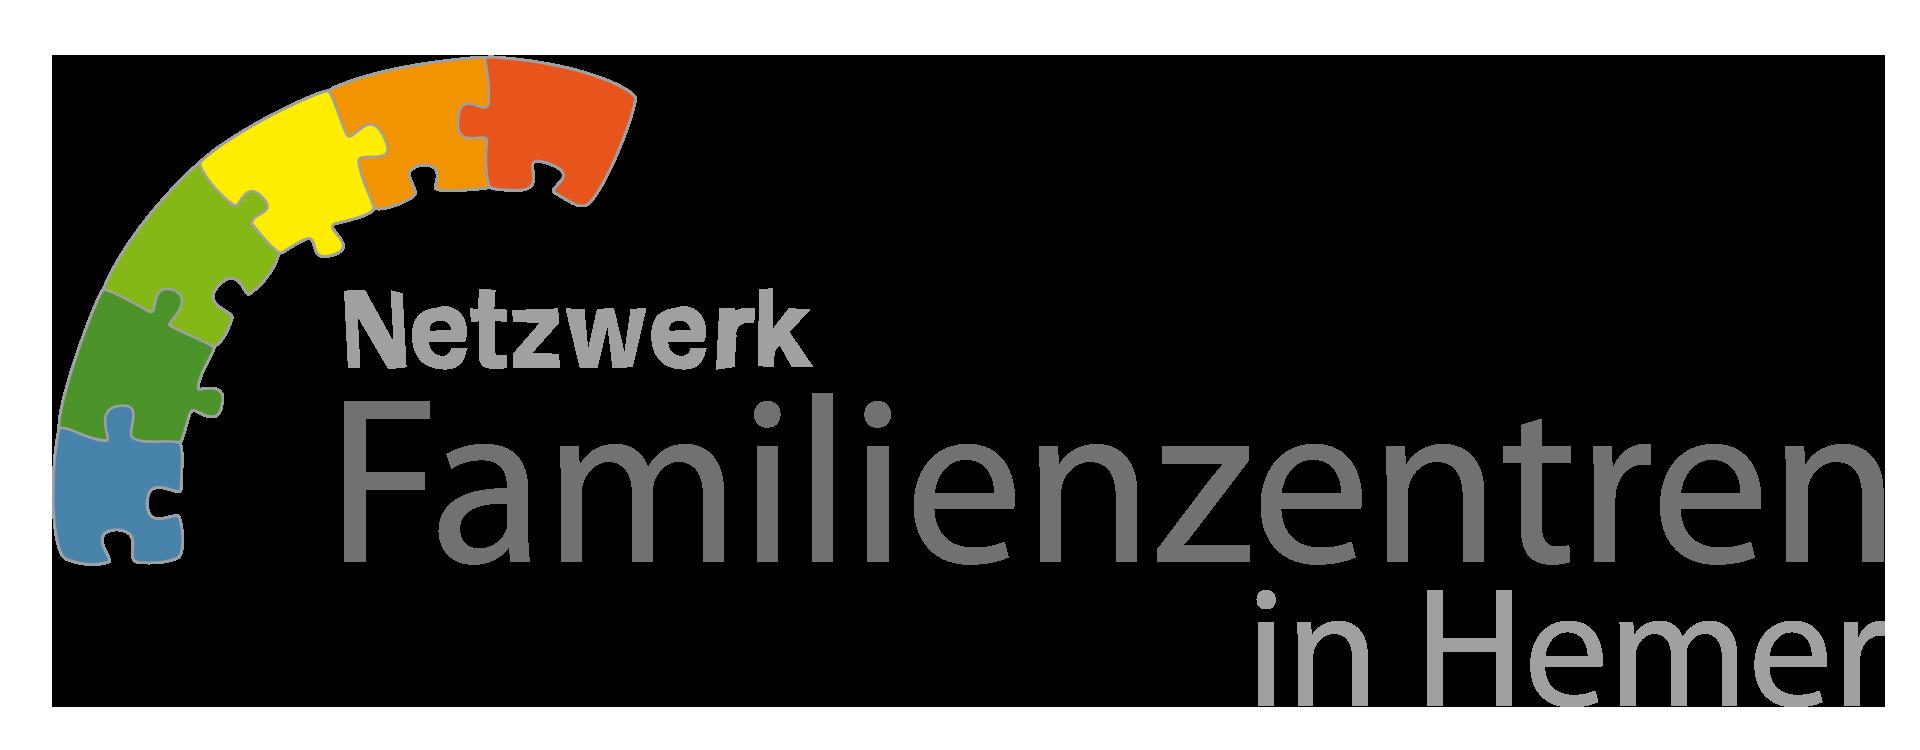 Netzwerk Familienzentren in Hemer